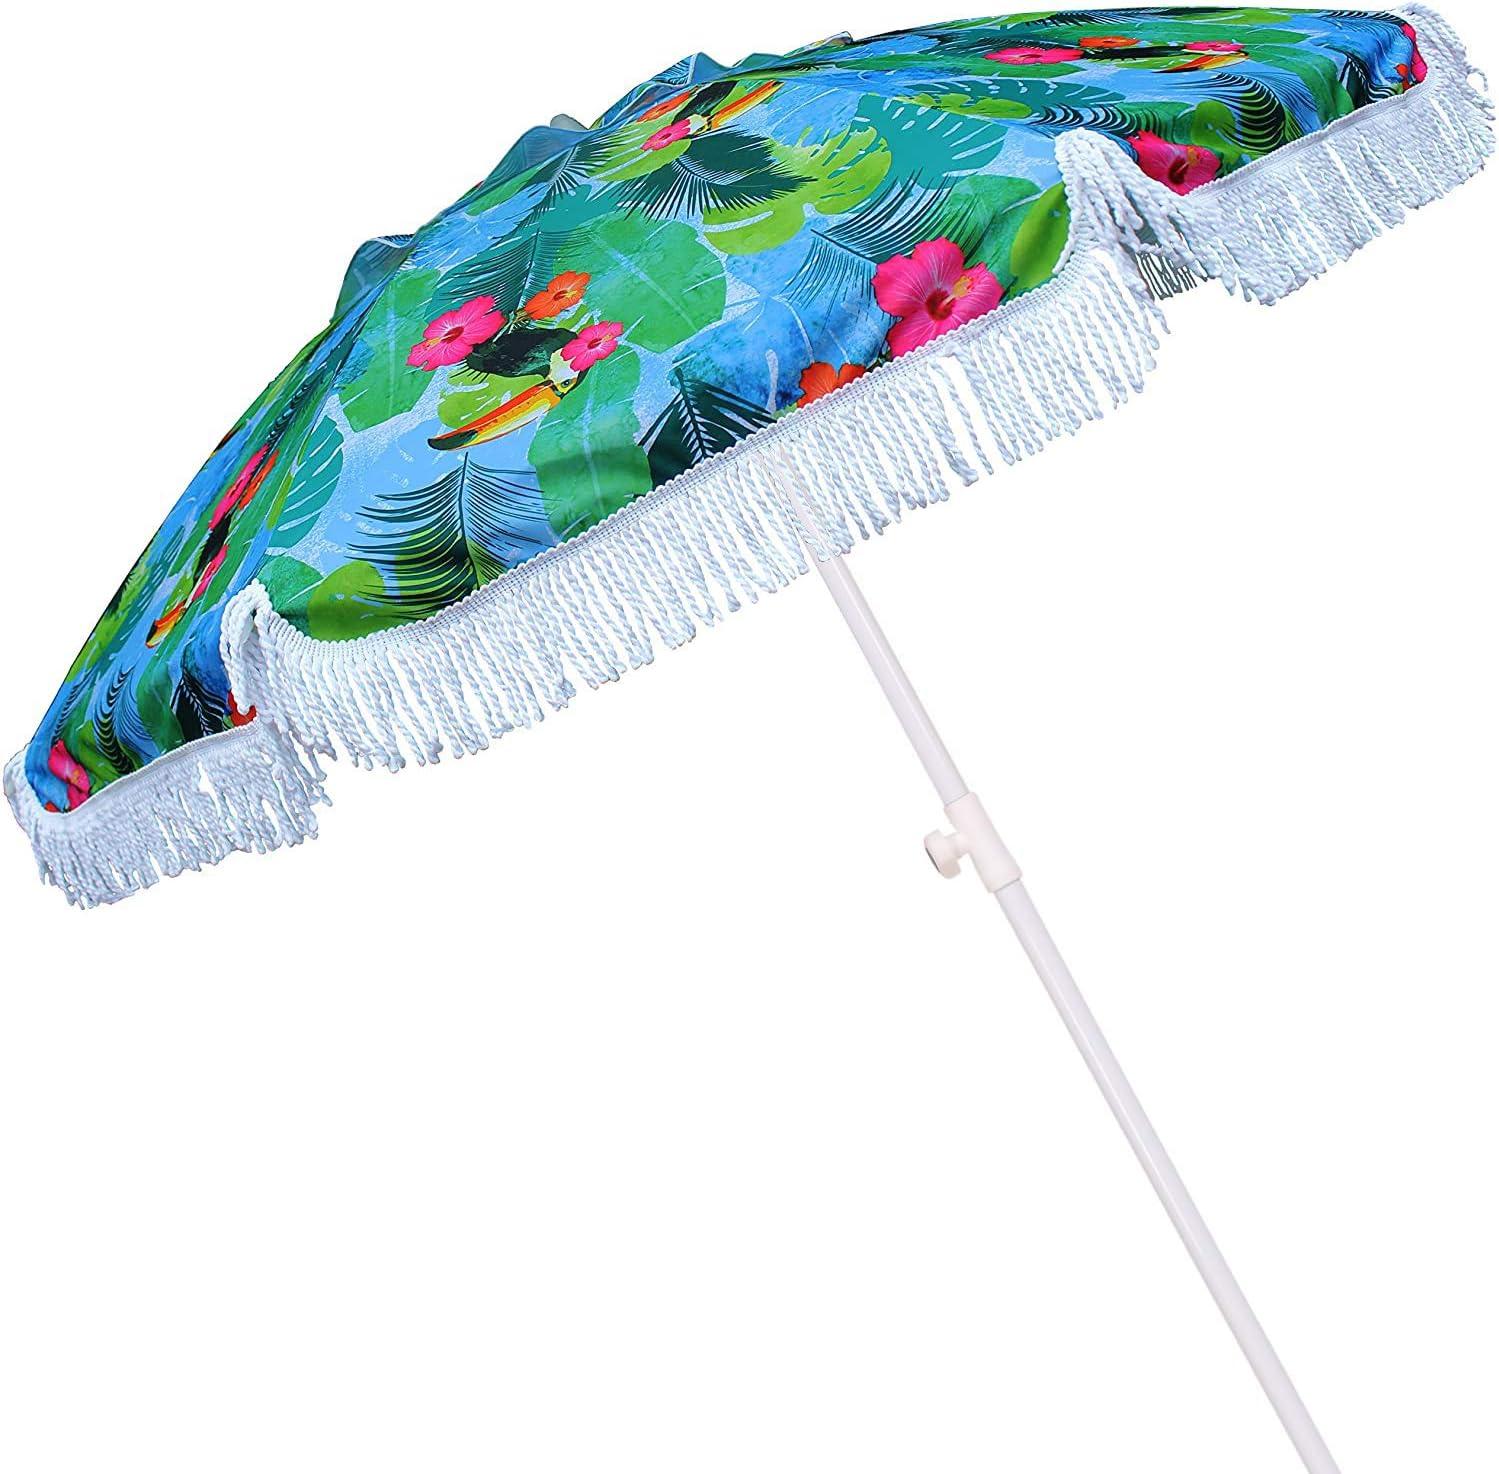 Best Beach Umbrella Australia - AMMSUN